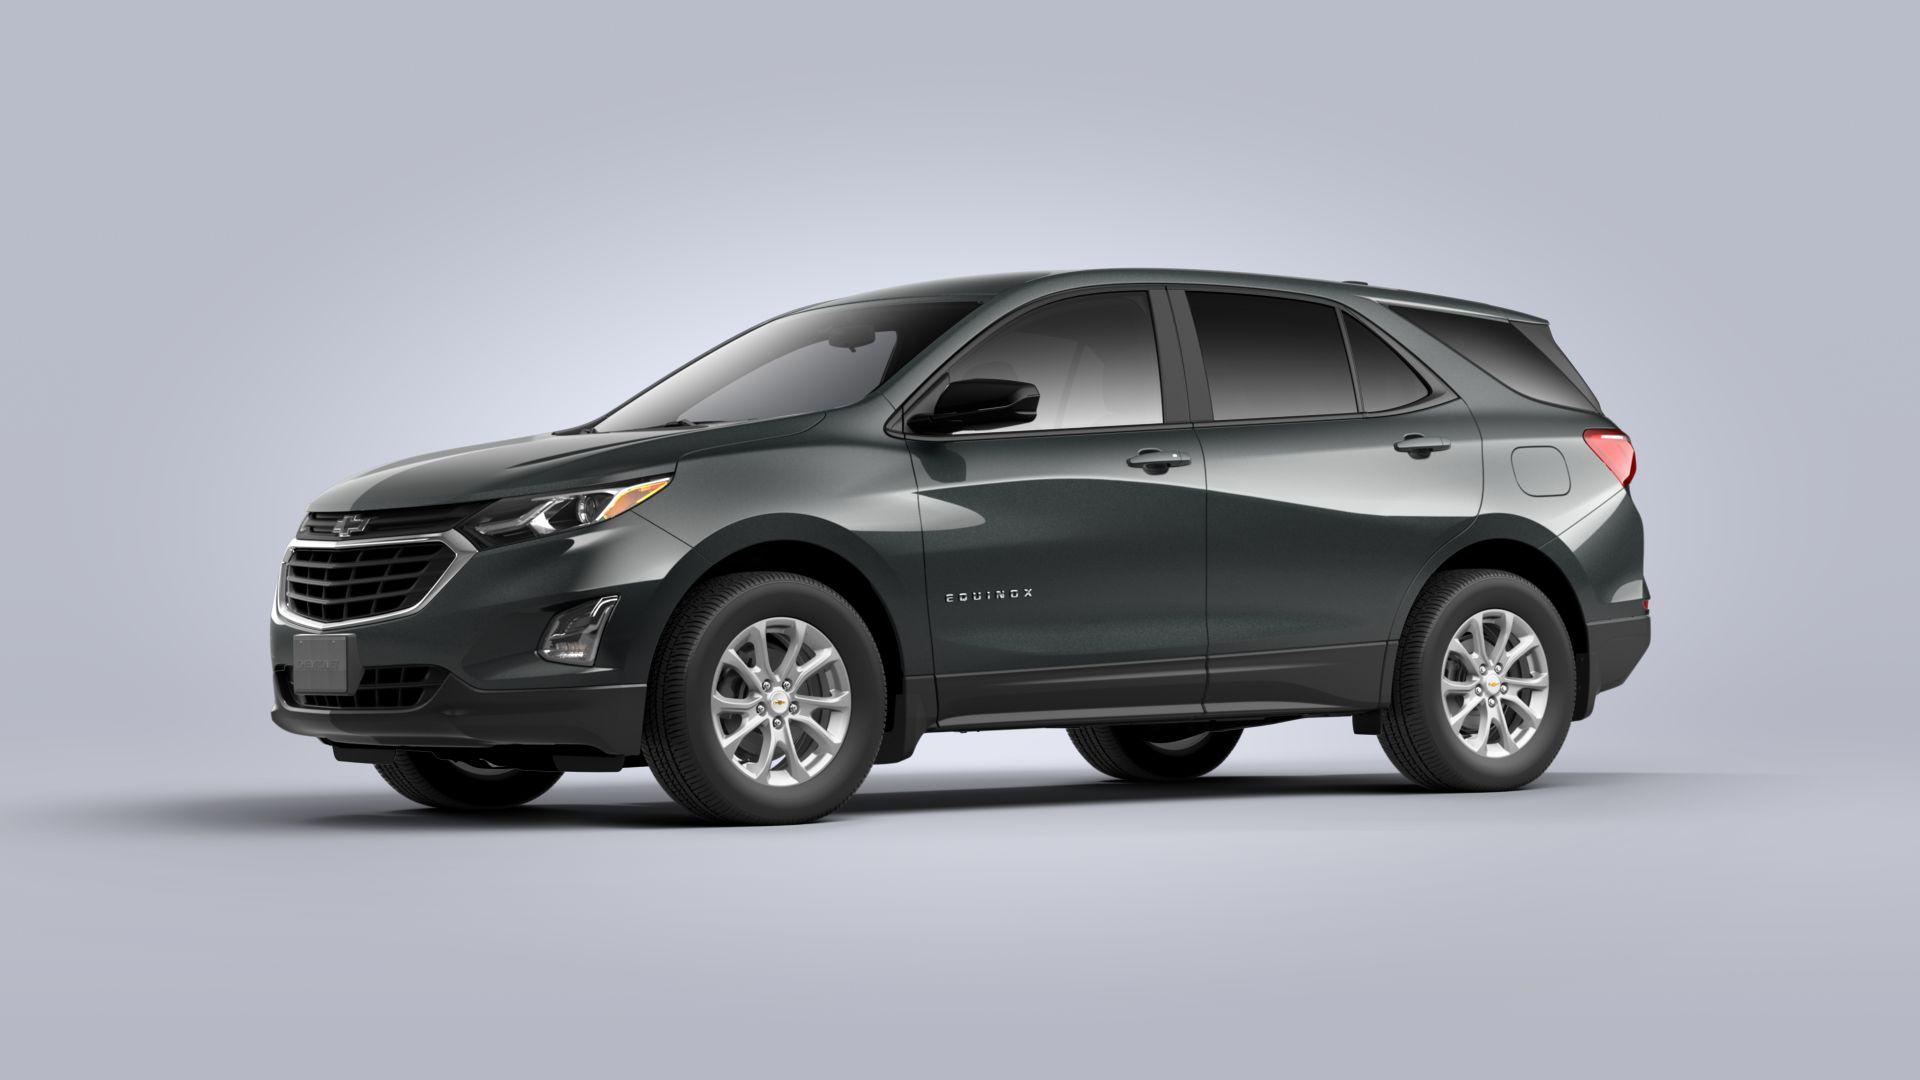 2021 Chevrolet Equinox SUV